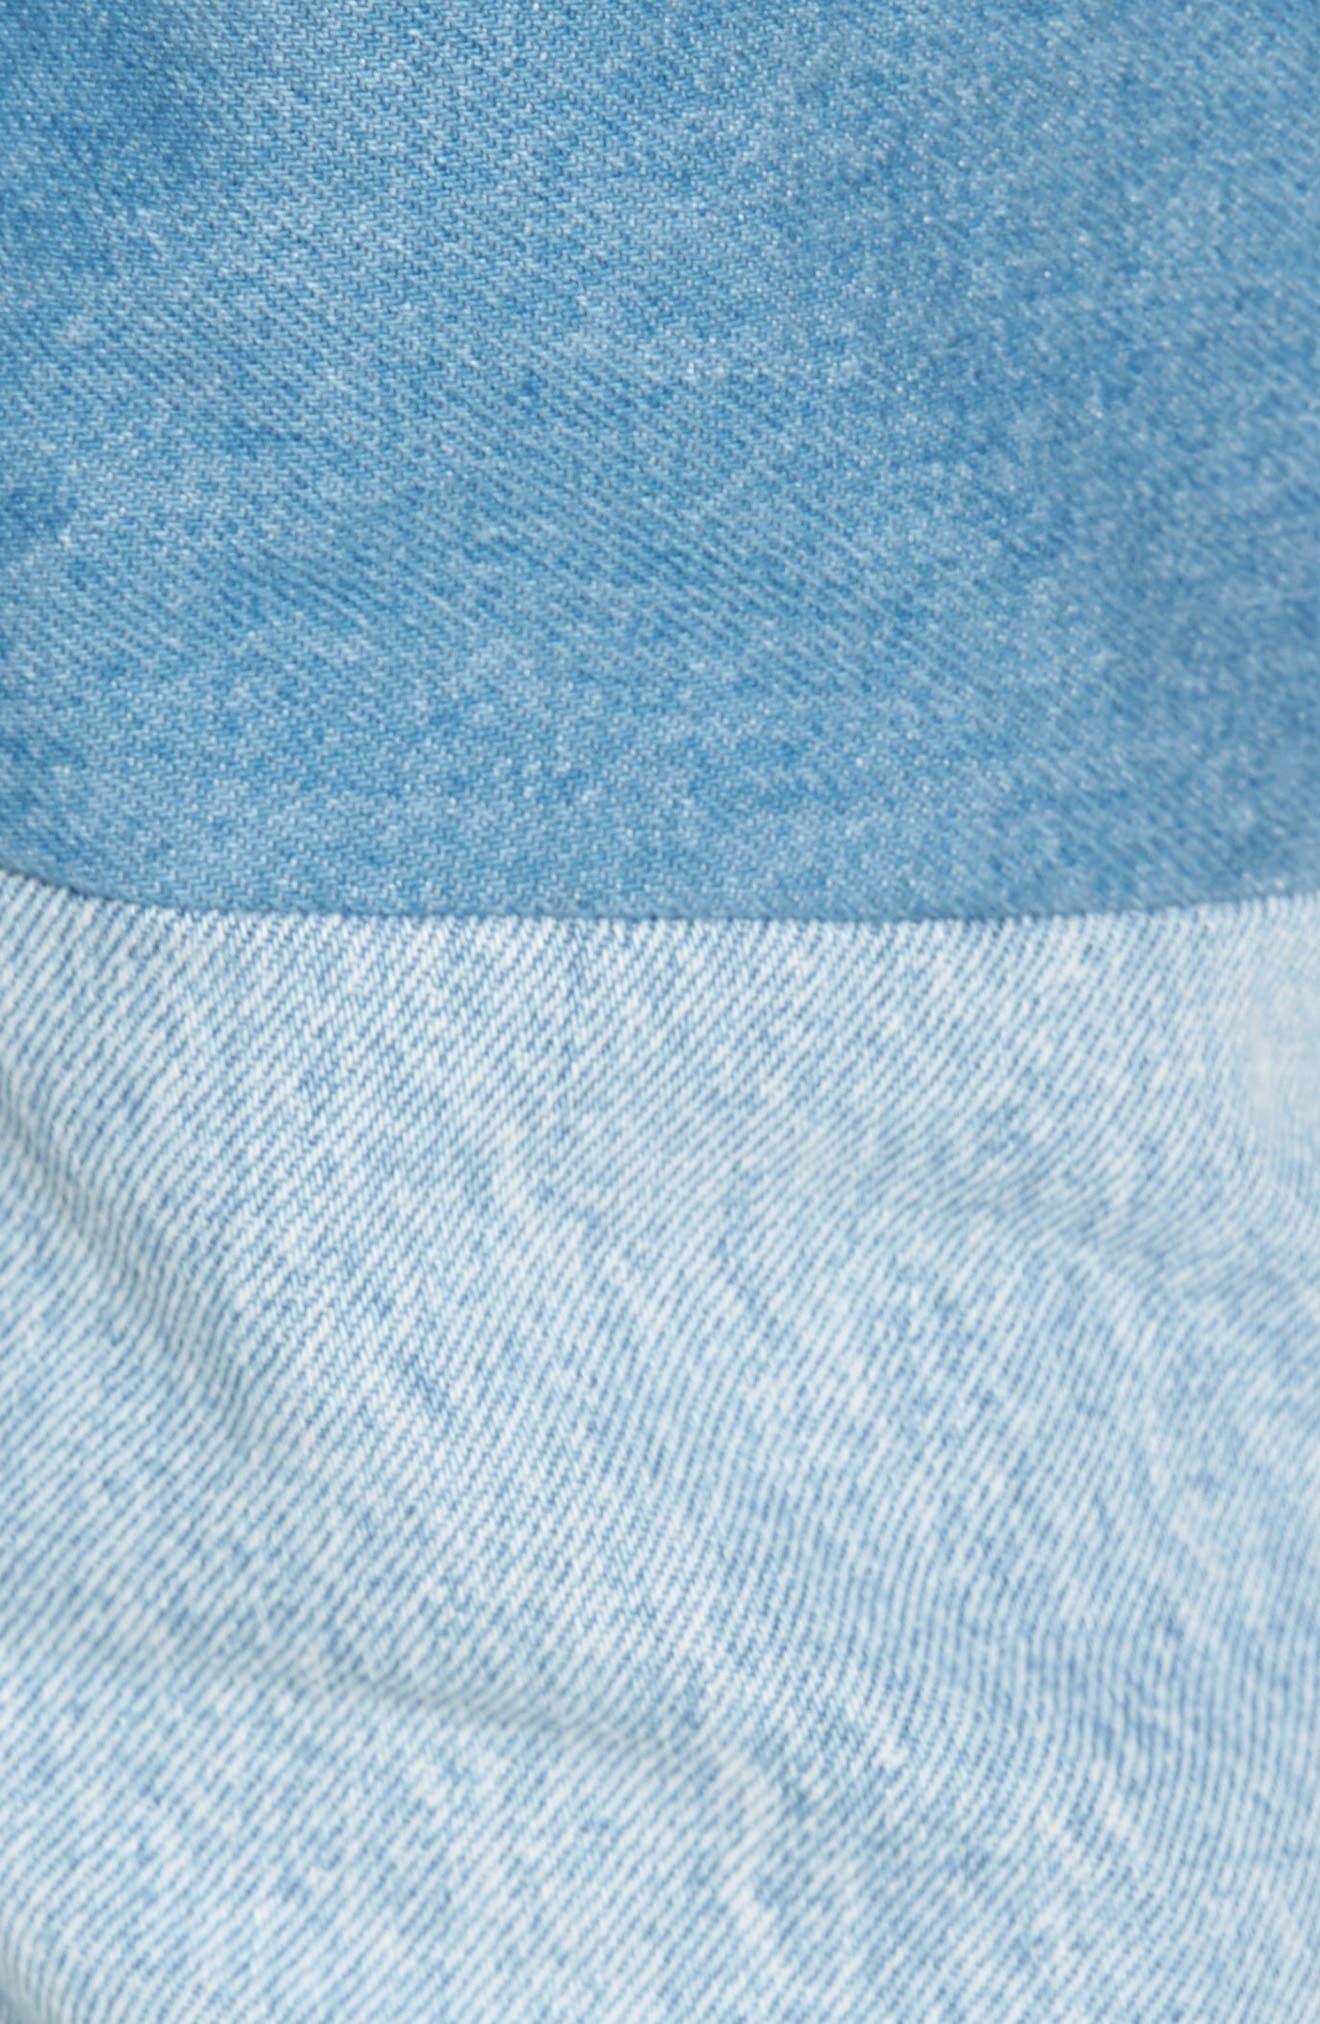 Studio Slim Fit Jeans,                             Alternate thumbnail 5, color,